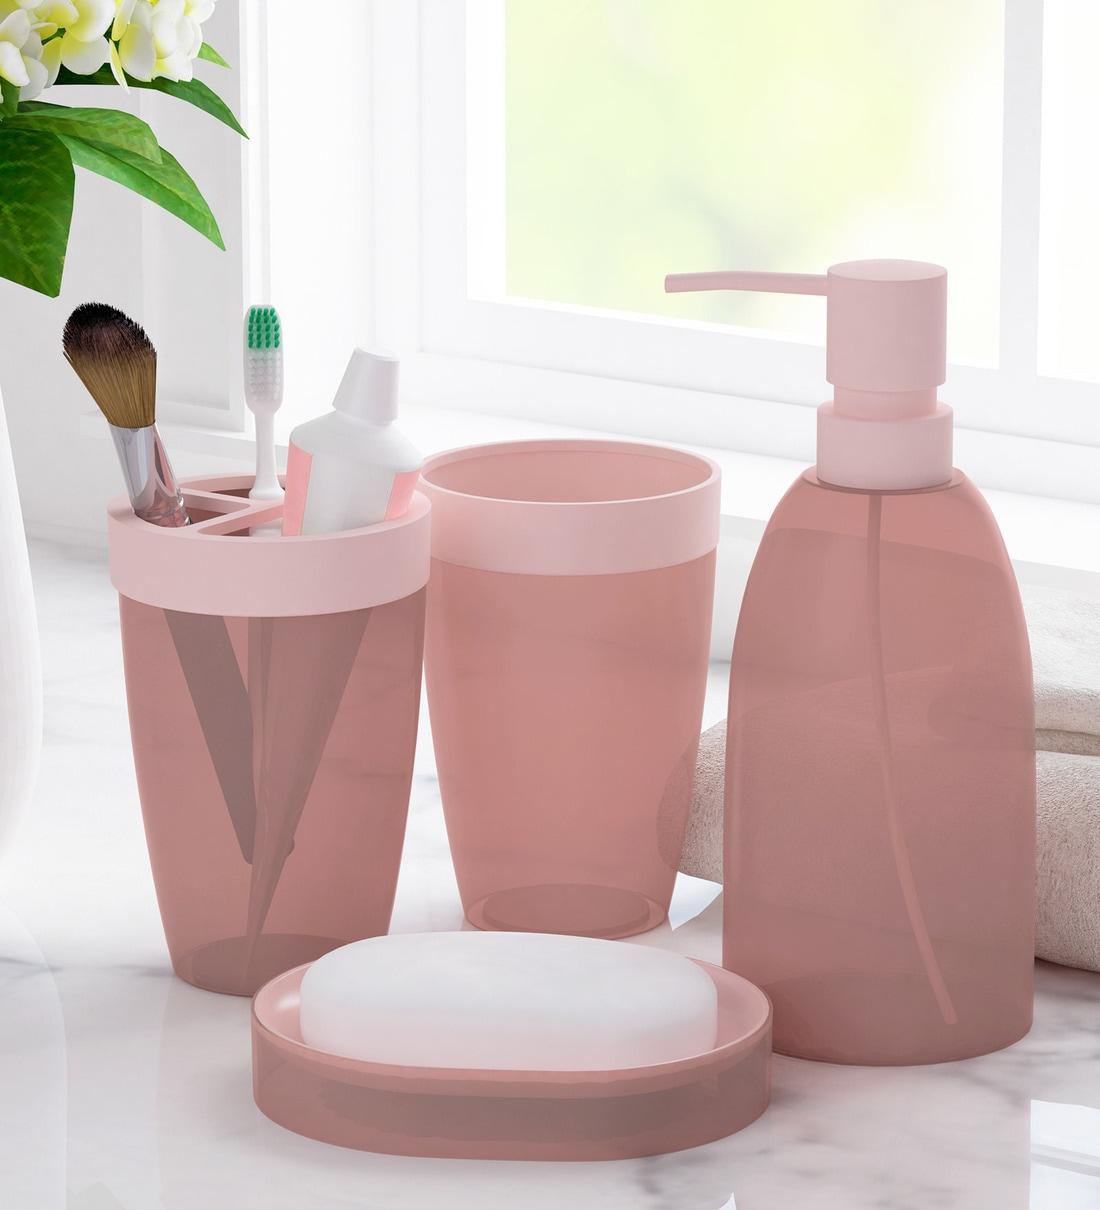 Polypropylene Counter Top Bathroom, Peach Bathroom Accessories